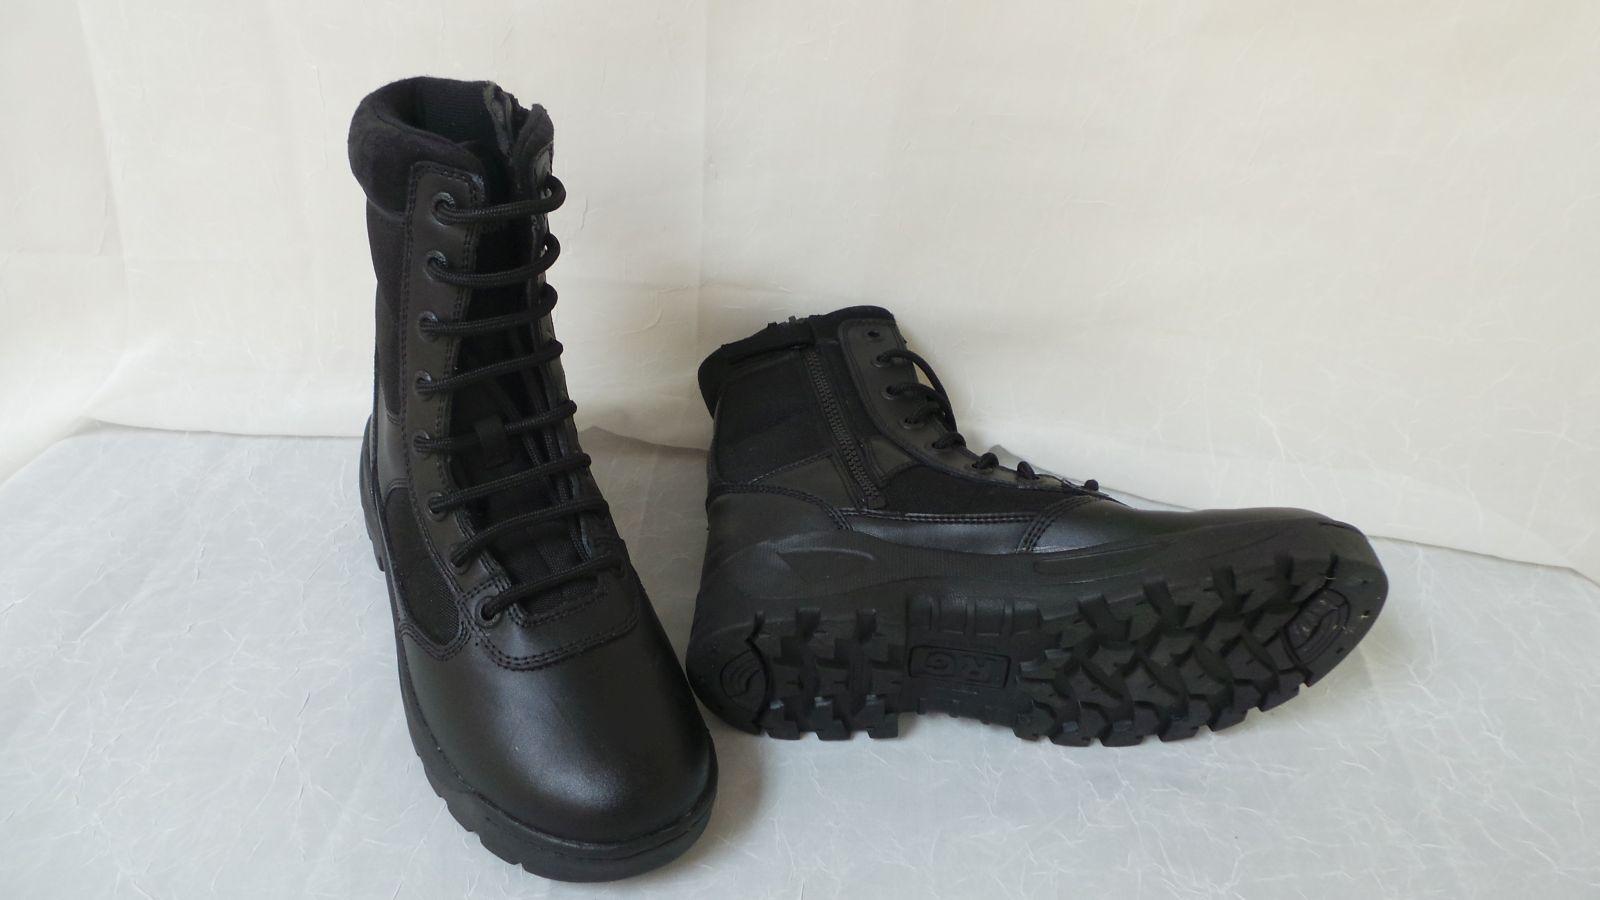 New  RG Response Gear Mens Size Zip II Tactical Boots-Style 1061   90G  la